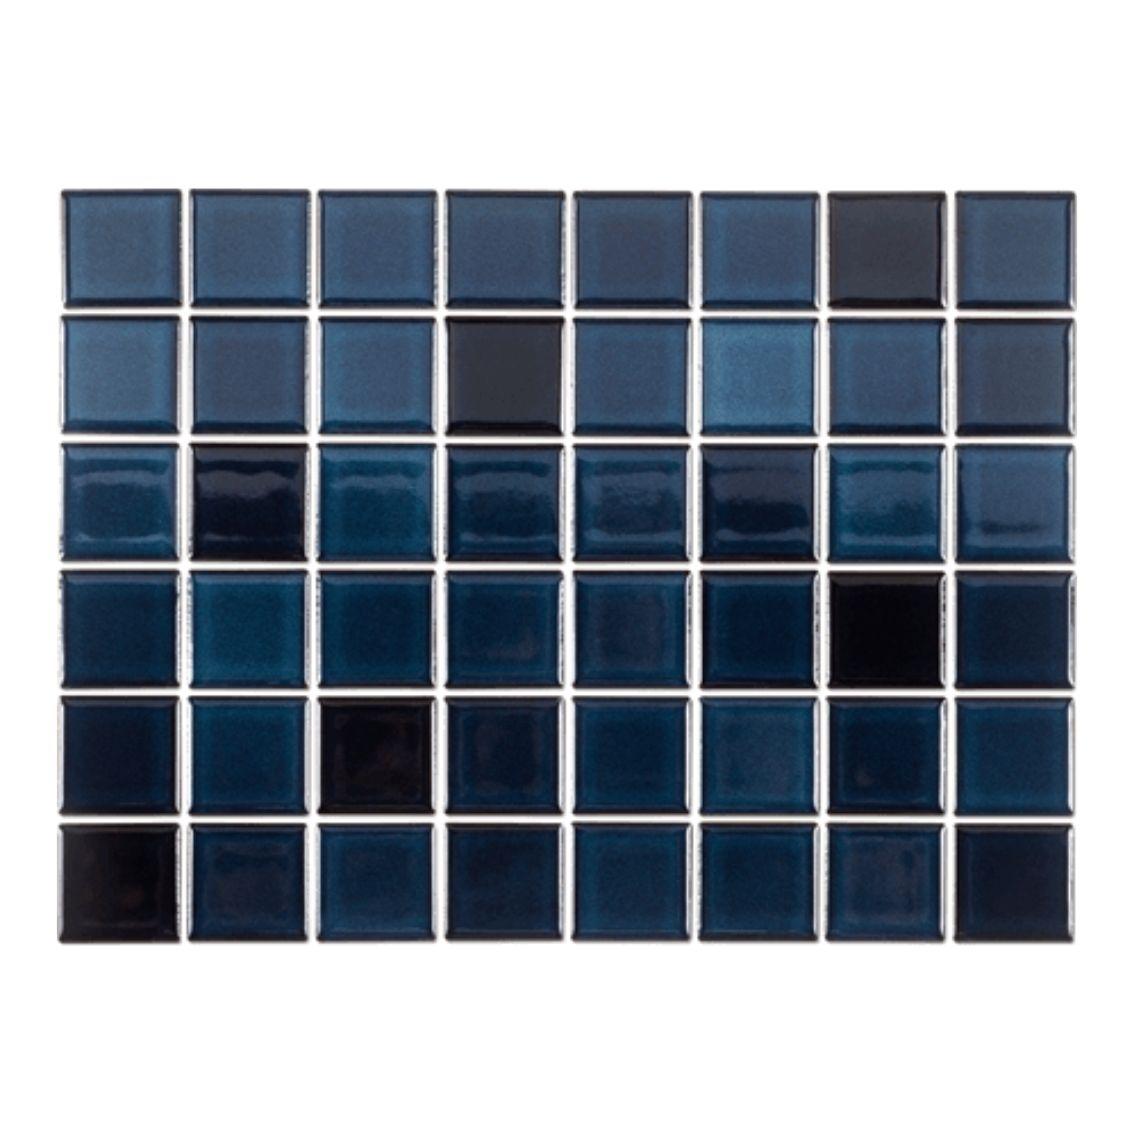 Pastilha Azul Maranhão GCR 5x5 cm <br /><b>R$ 138,00 M² </b><br />Cx 0,84 M² <b> R$ 115,92</b>